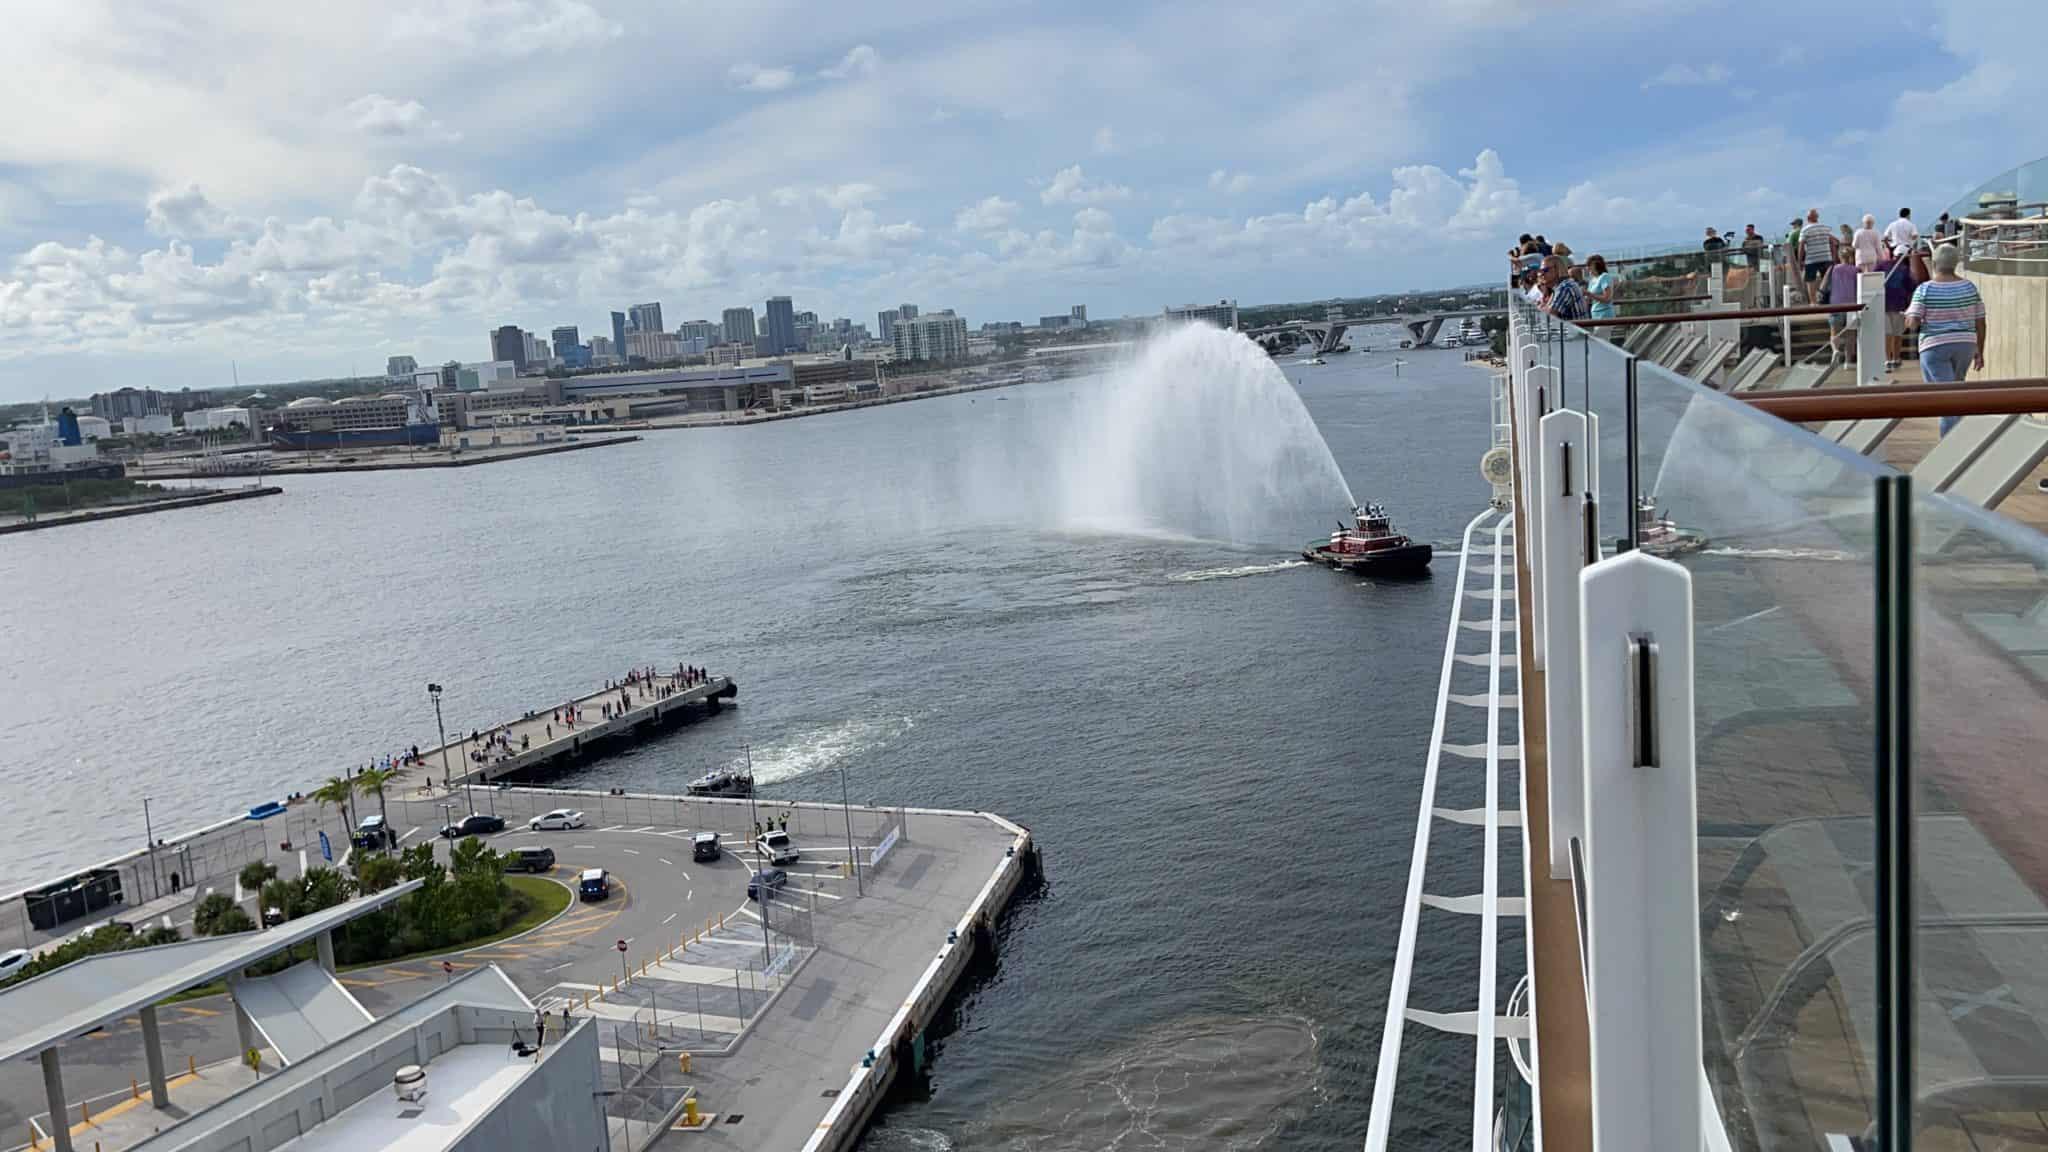 port everglades celebrity edge sail away